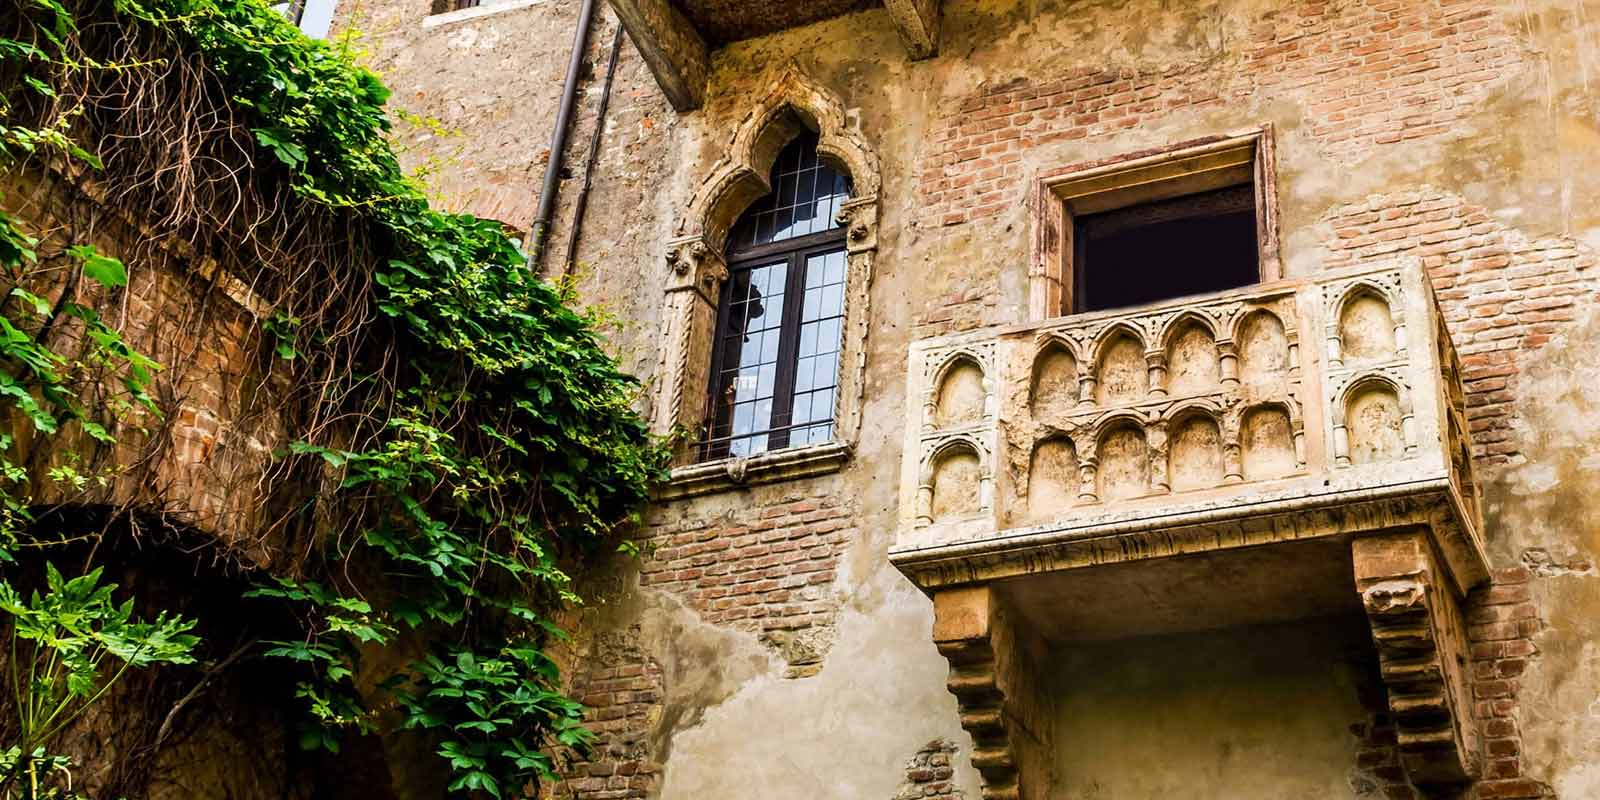 Venice Simplon Orient Express Verona to Paris